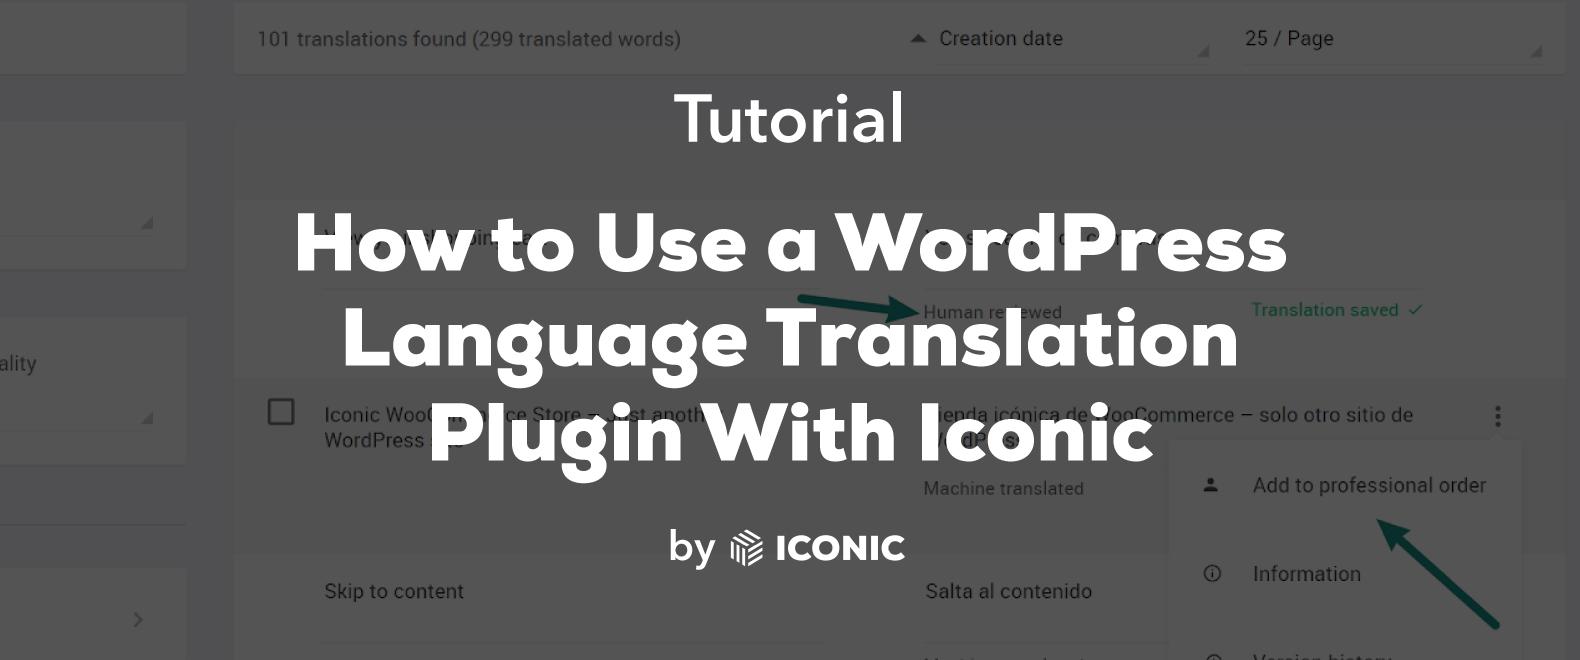 WordPress Language Translation Plugin With Iconic